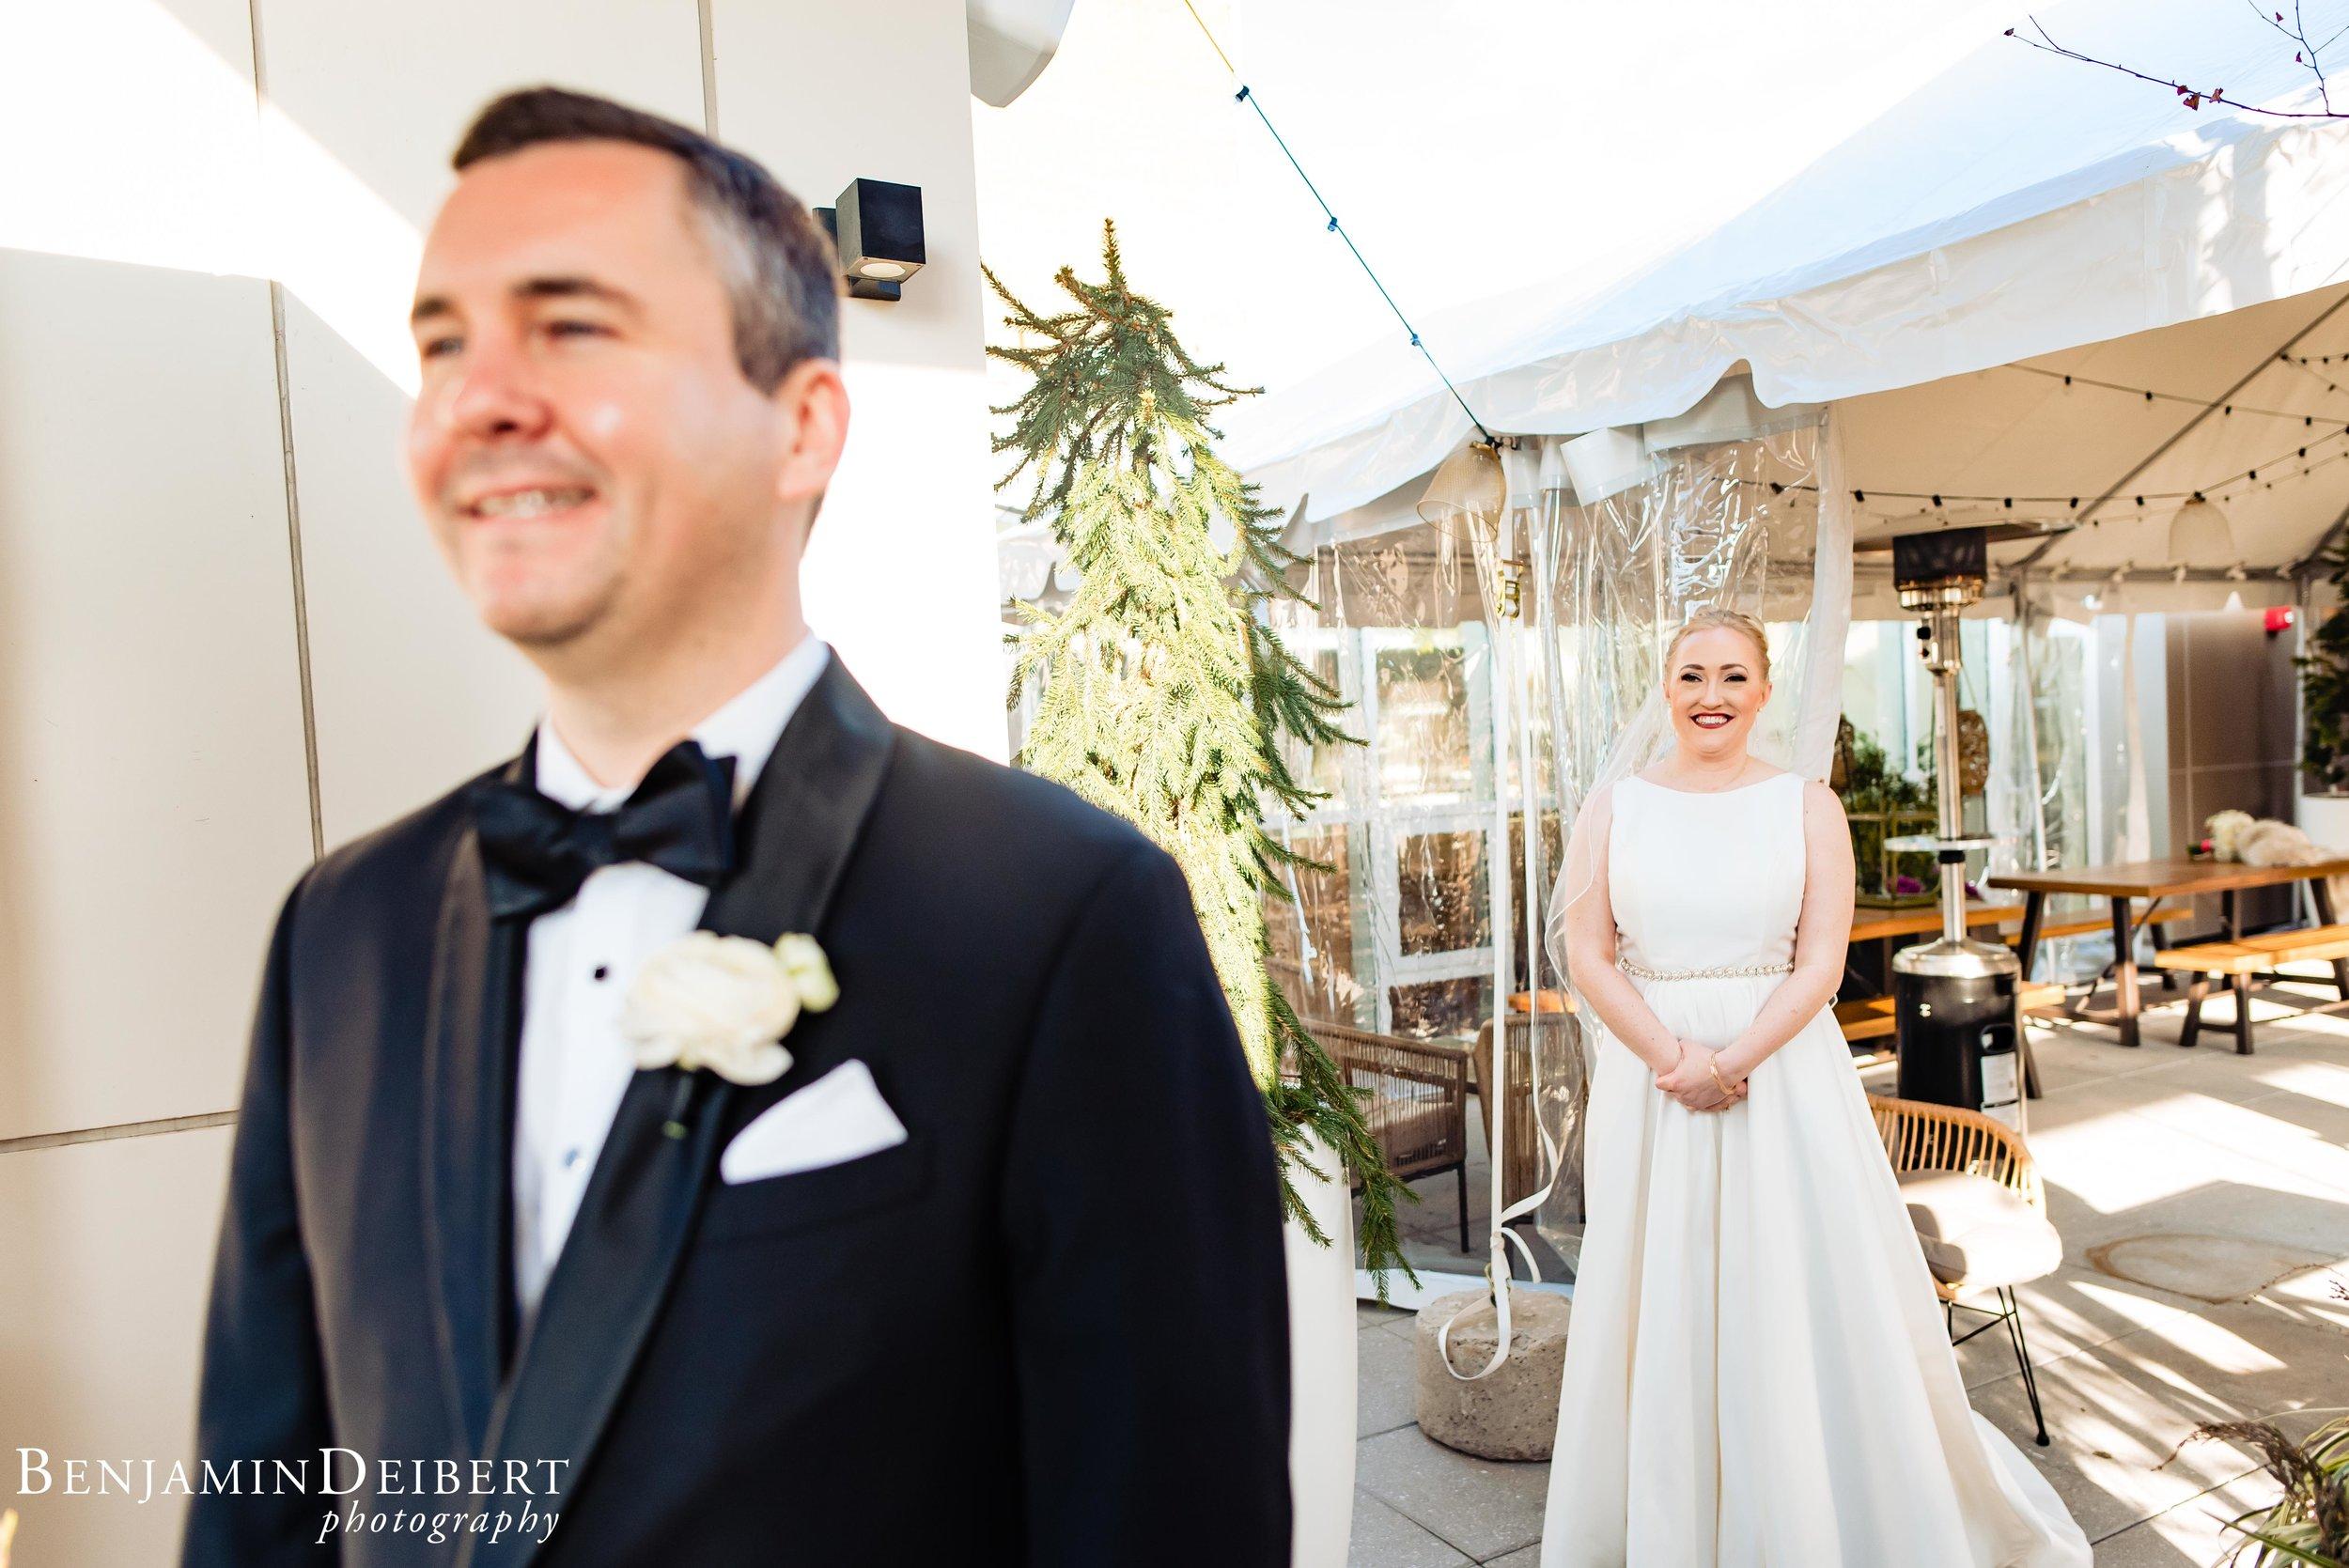 PatriceandAdam_TheLucy__Cescaphe_Wedding-15.jpg